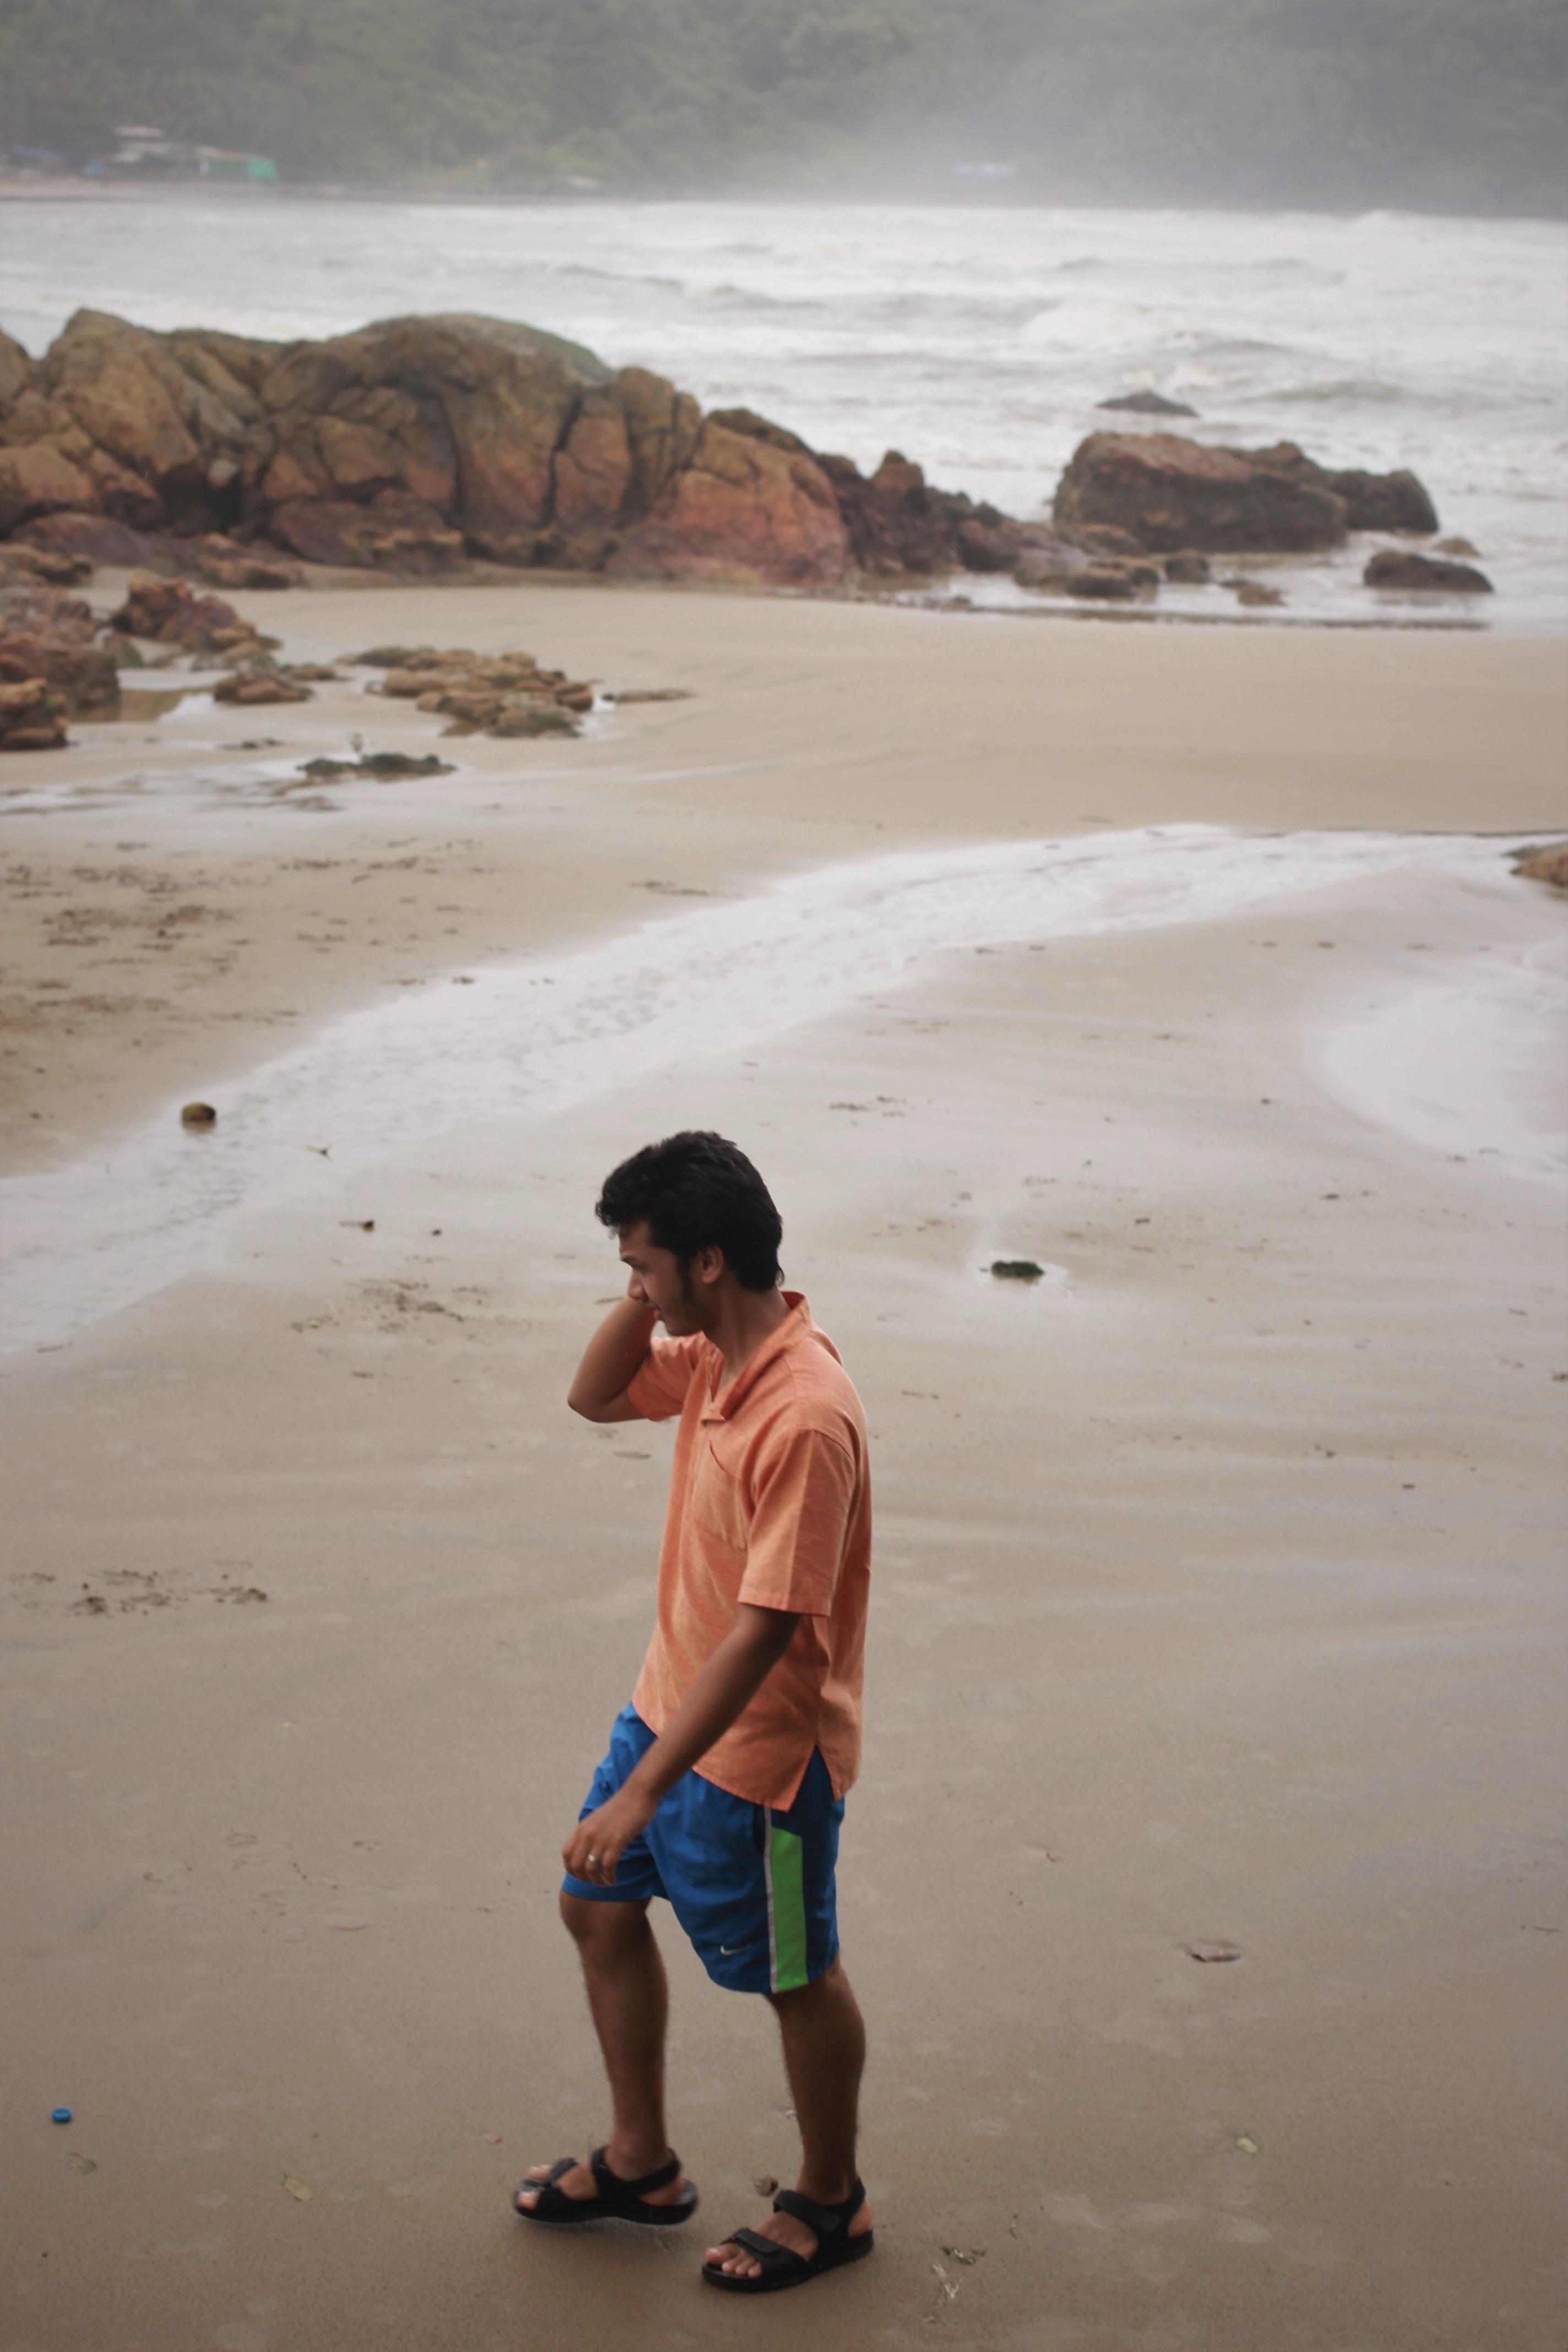 Go to Vikas Shankarathota's profile